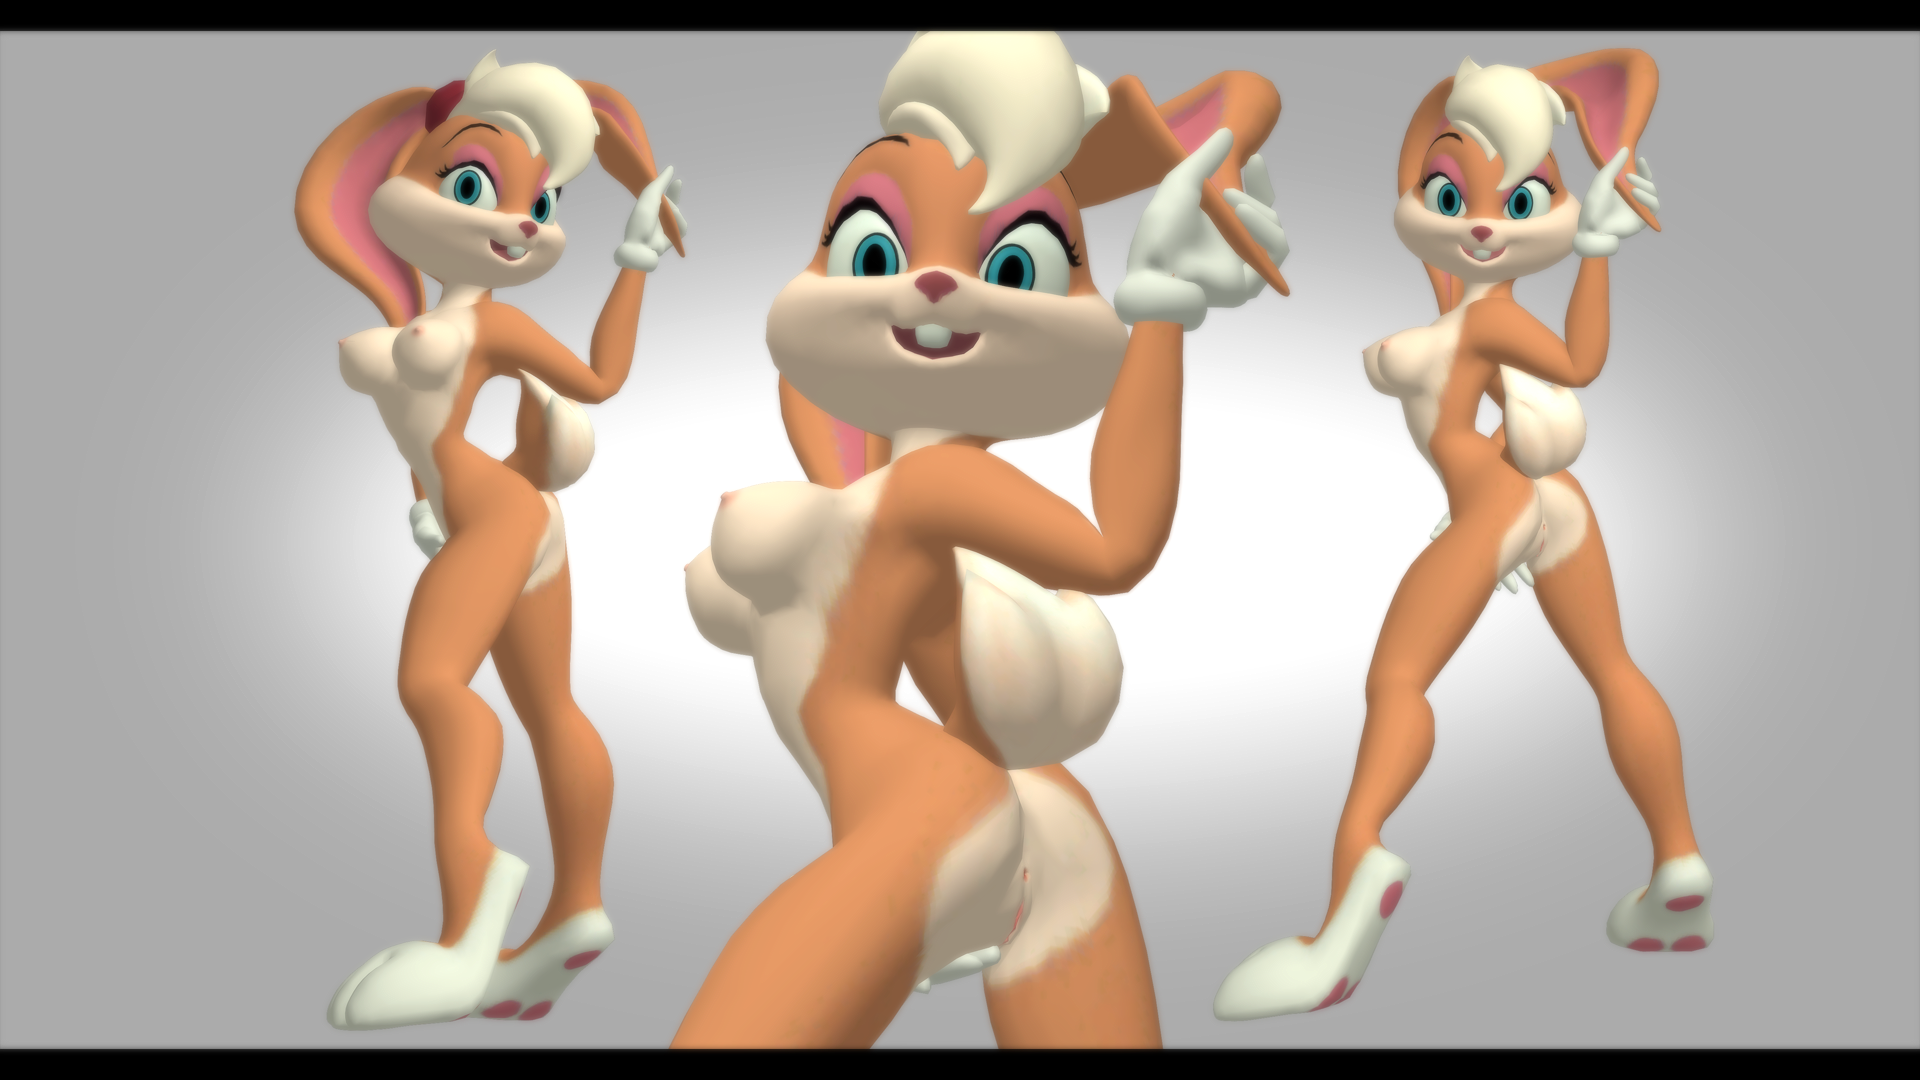 Looney Tunes Porn image #137087